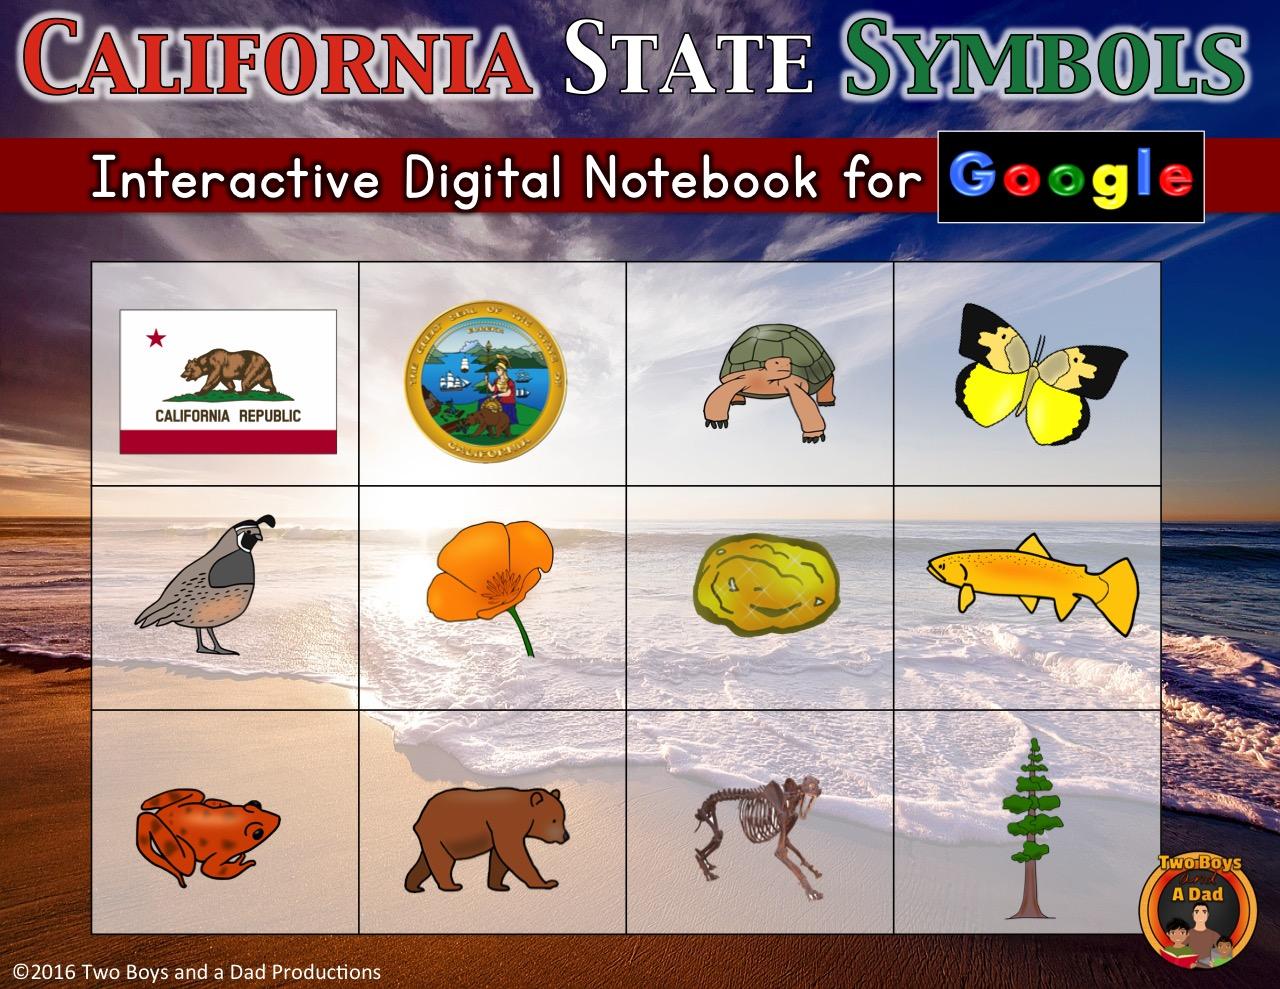 California State Symbols Interactive Digital Notebook